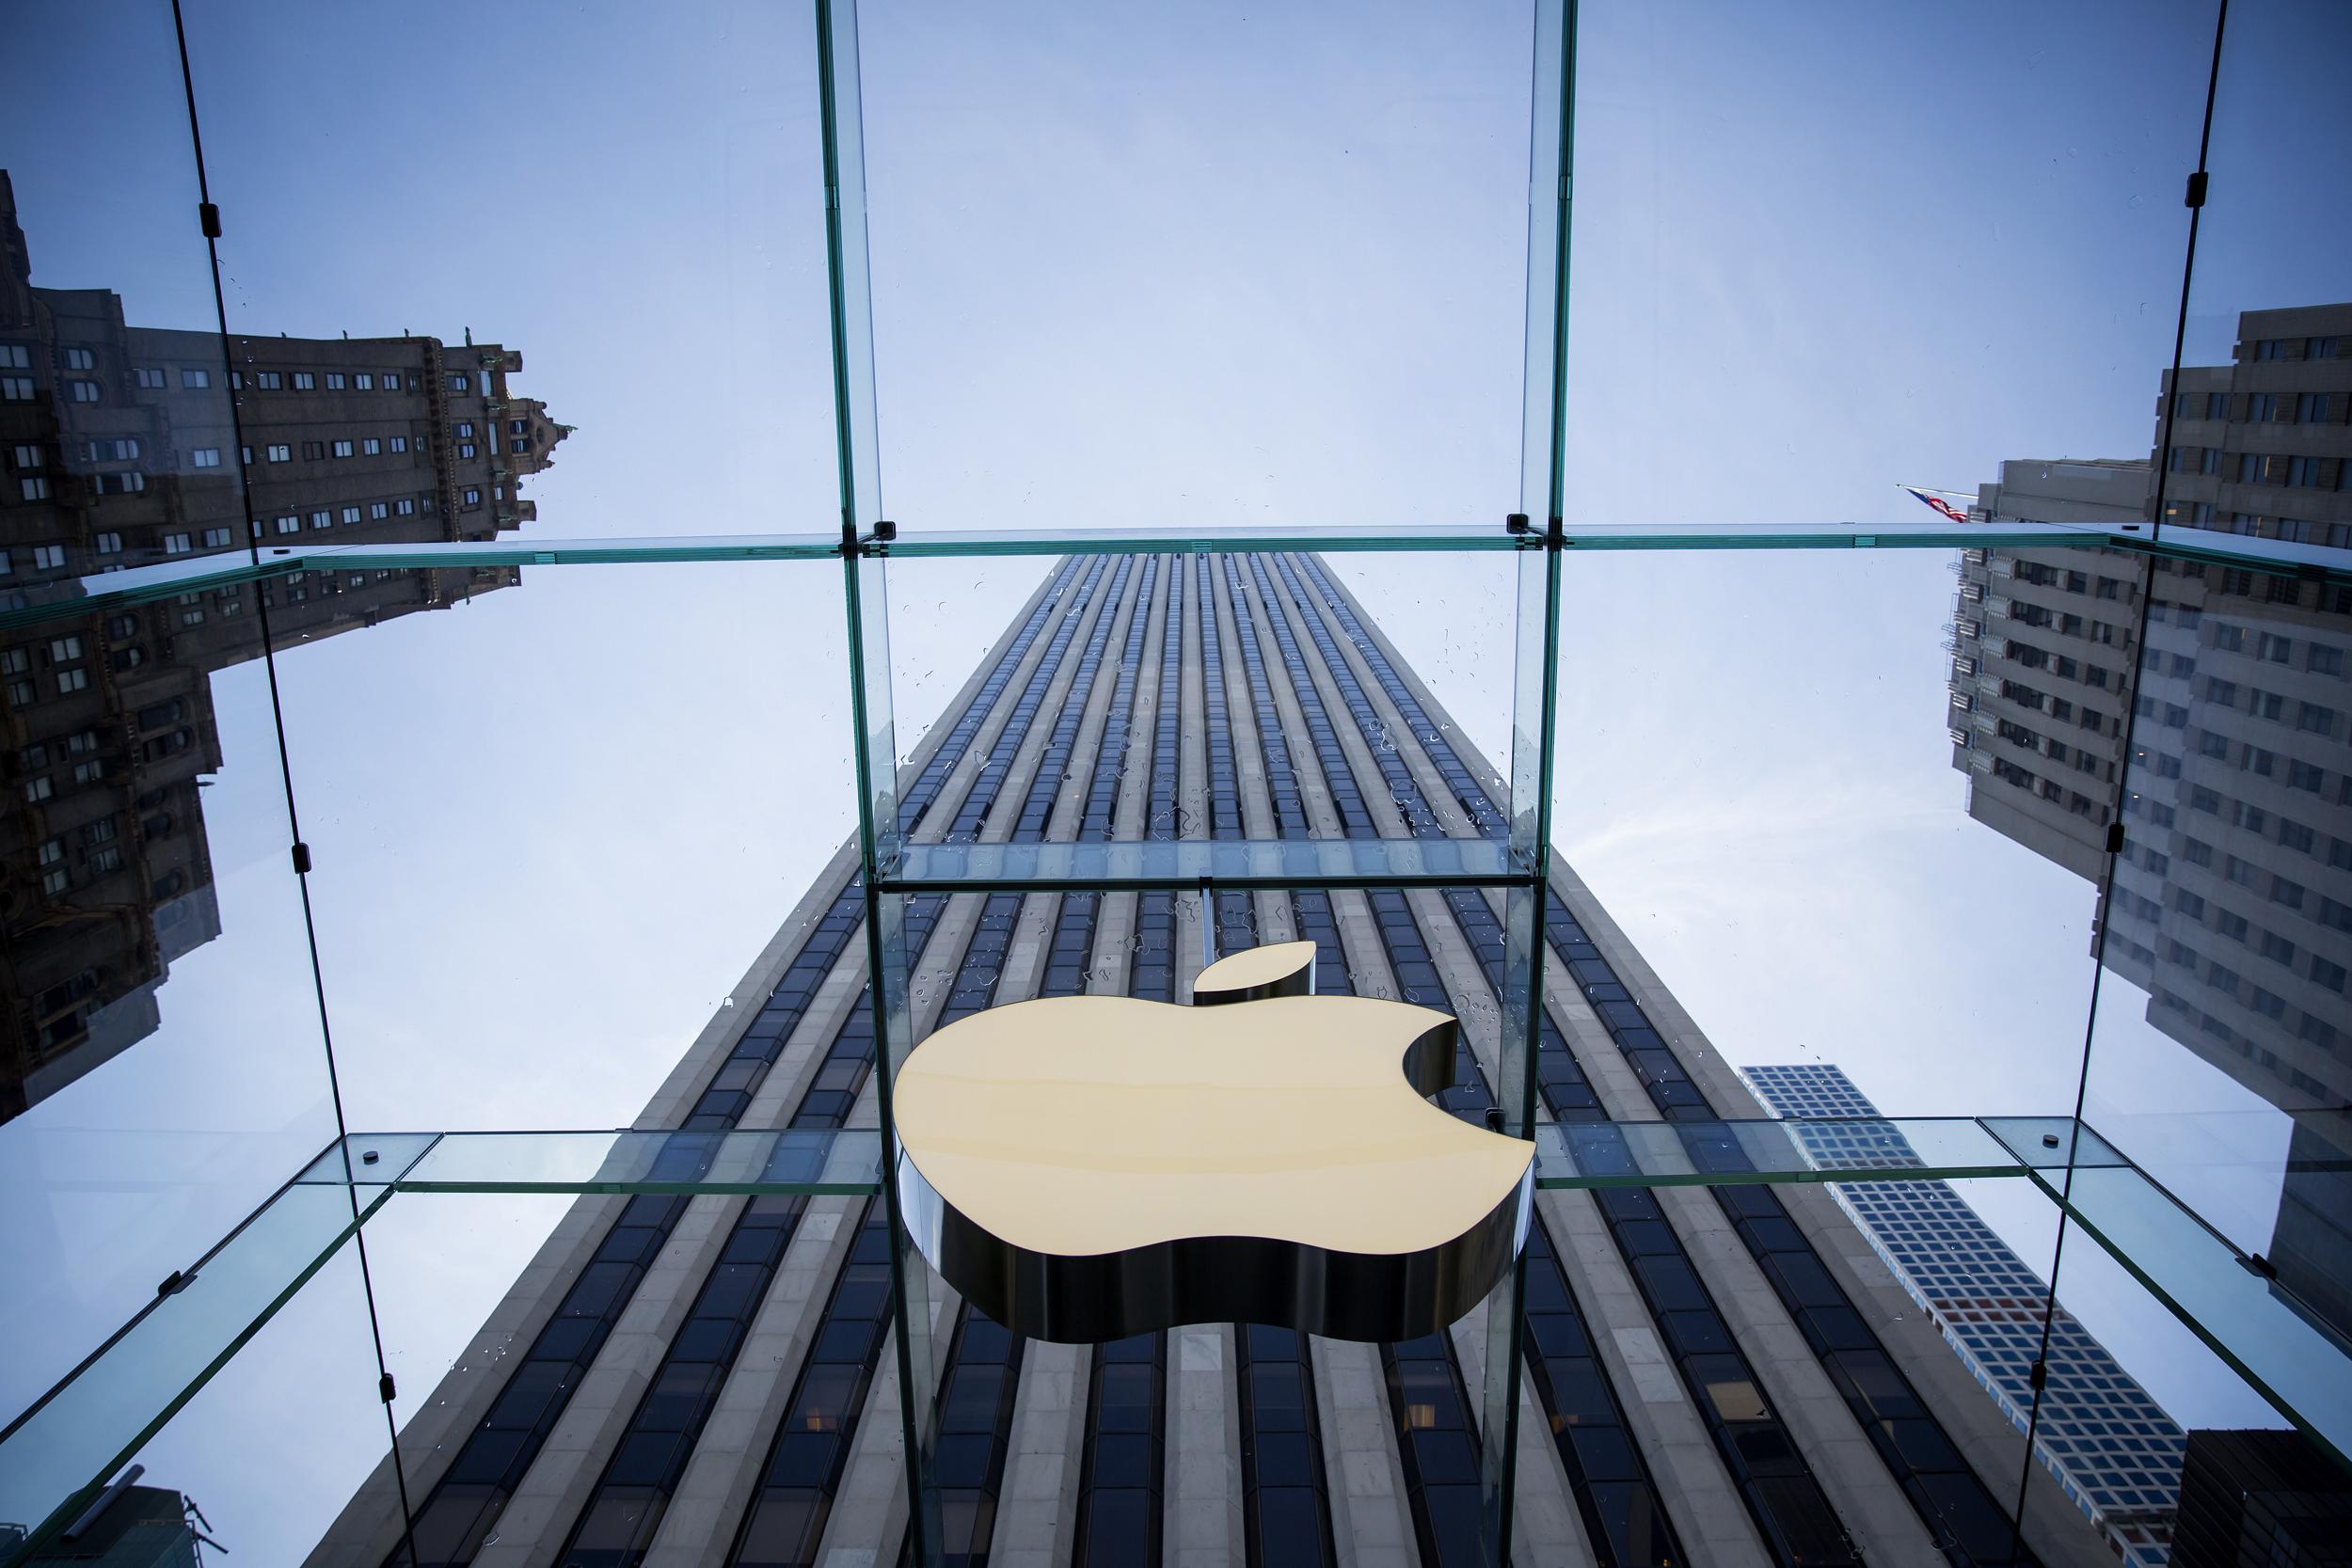 161026-apple-logo-store-211p_9edbb31f4f9